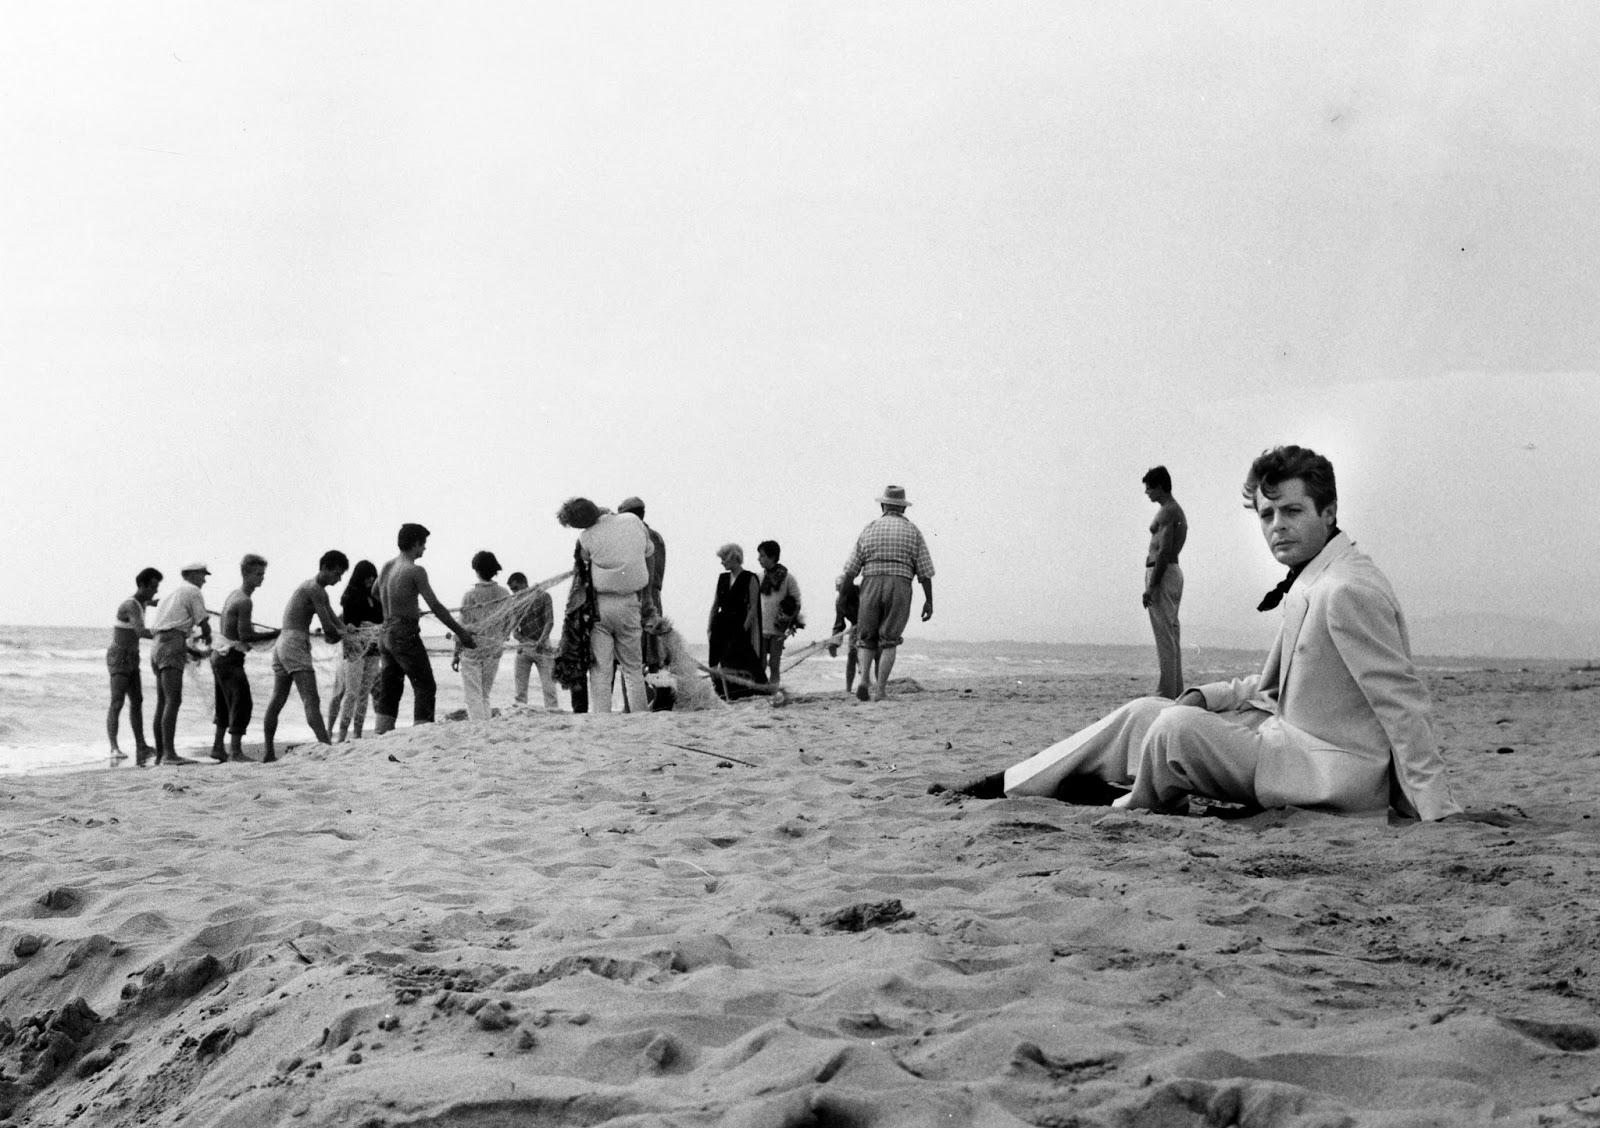 film excess la dolce vita 1960 fellini 39 s immortal masterpiece. Black Bedroom Furniture Sets. Home Design Ideas